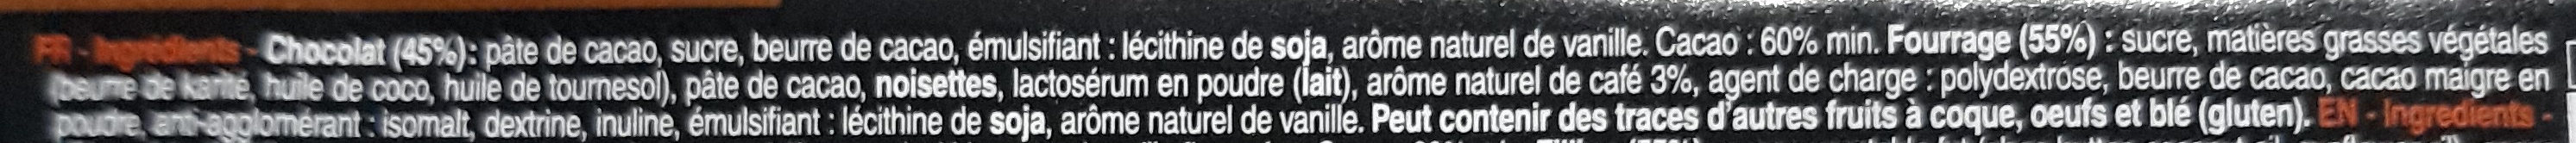 Bâton Galler Café-Noir - Ingrédients - fr